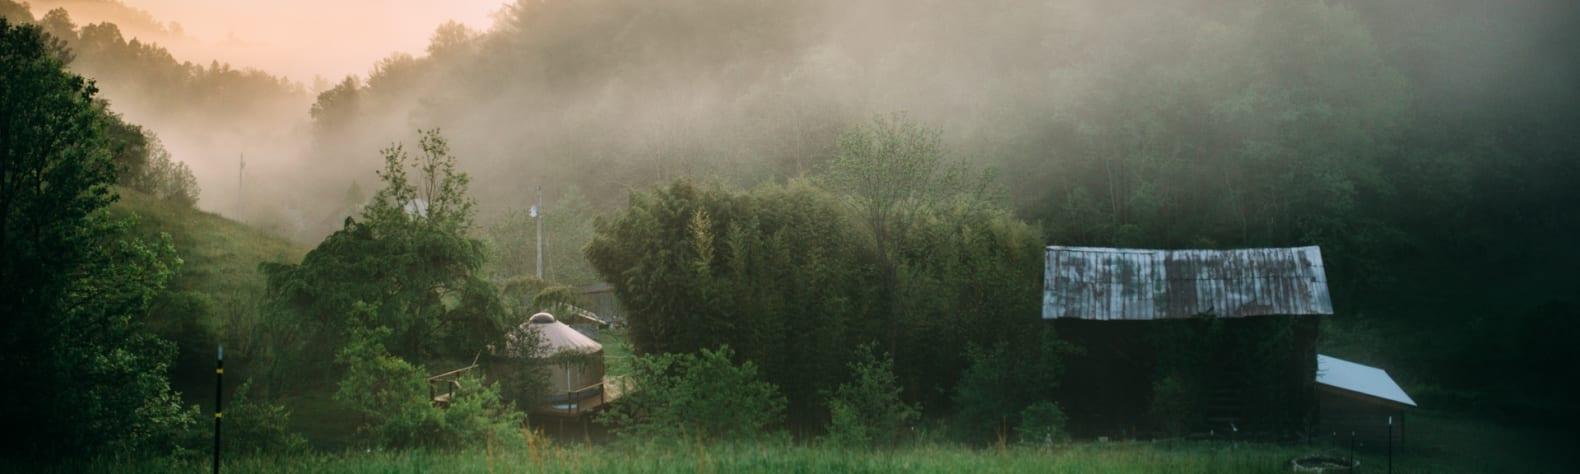 Mountain Cove Farm and Getaways